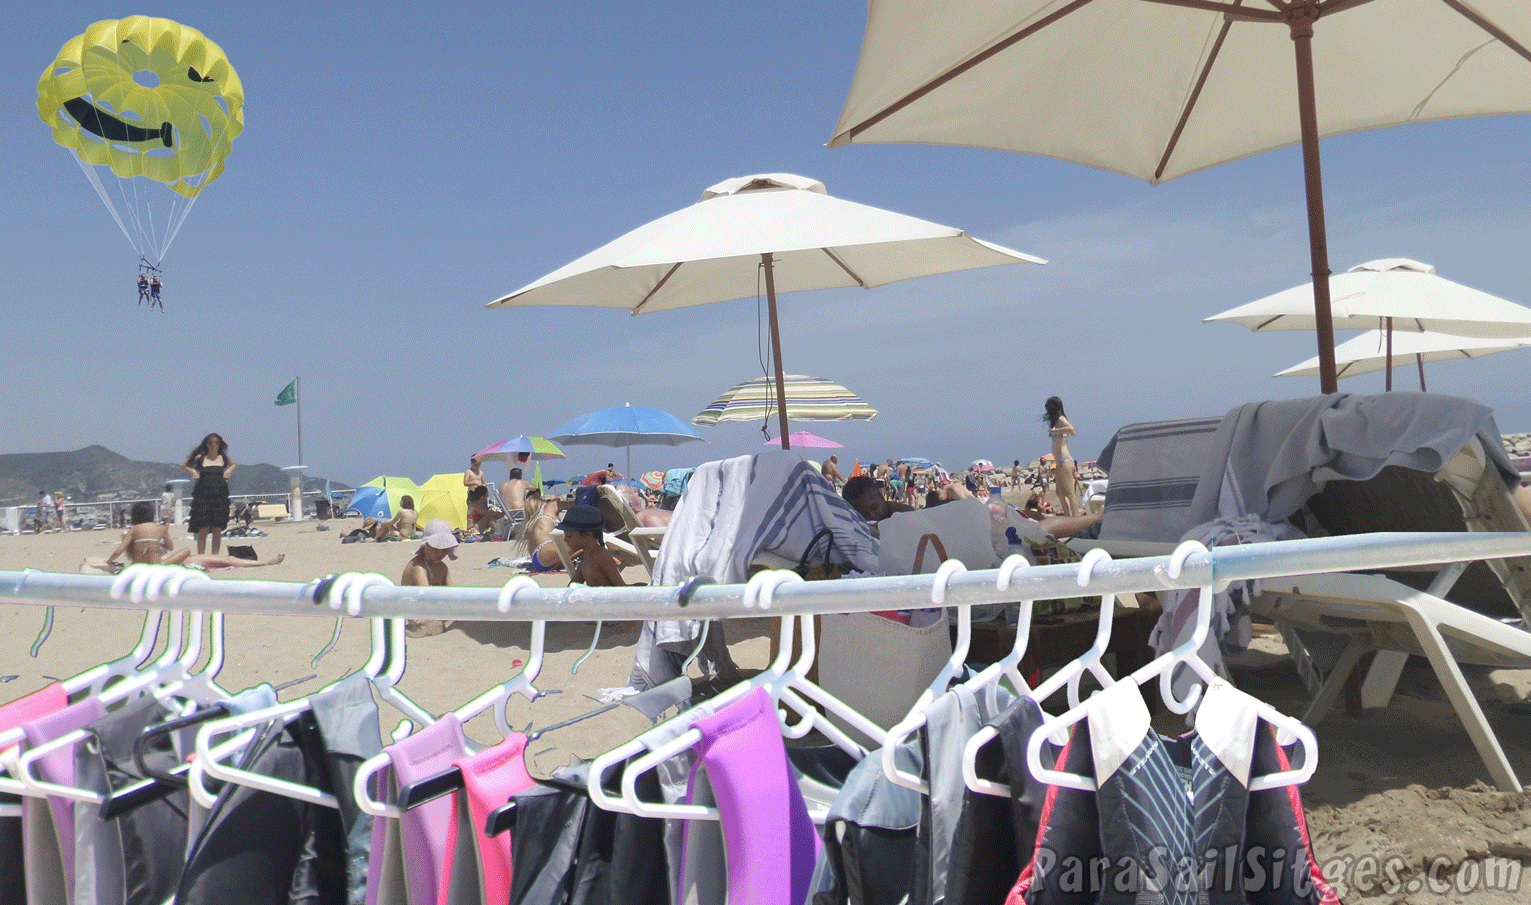 w-parasail-group